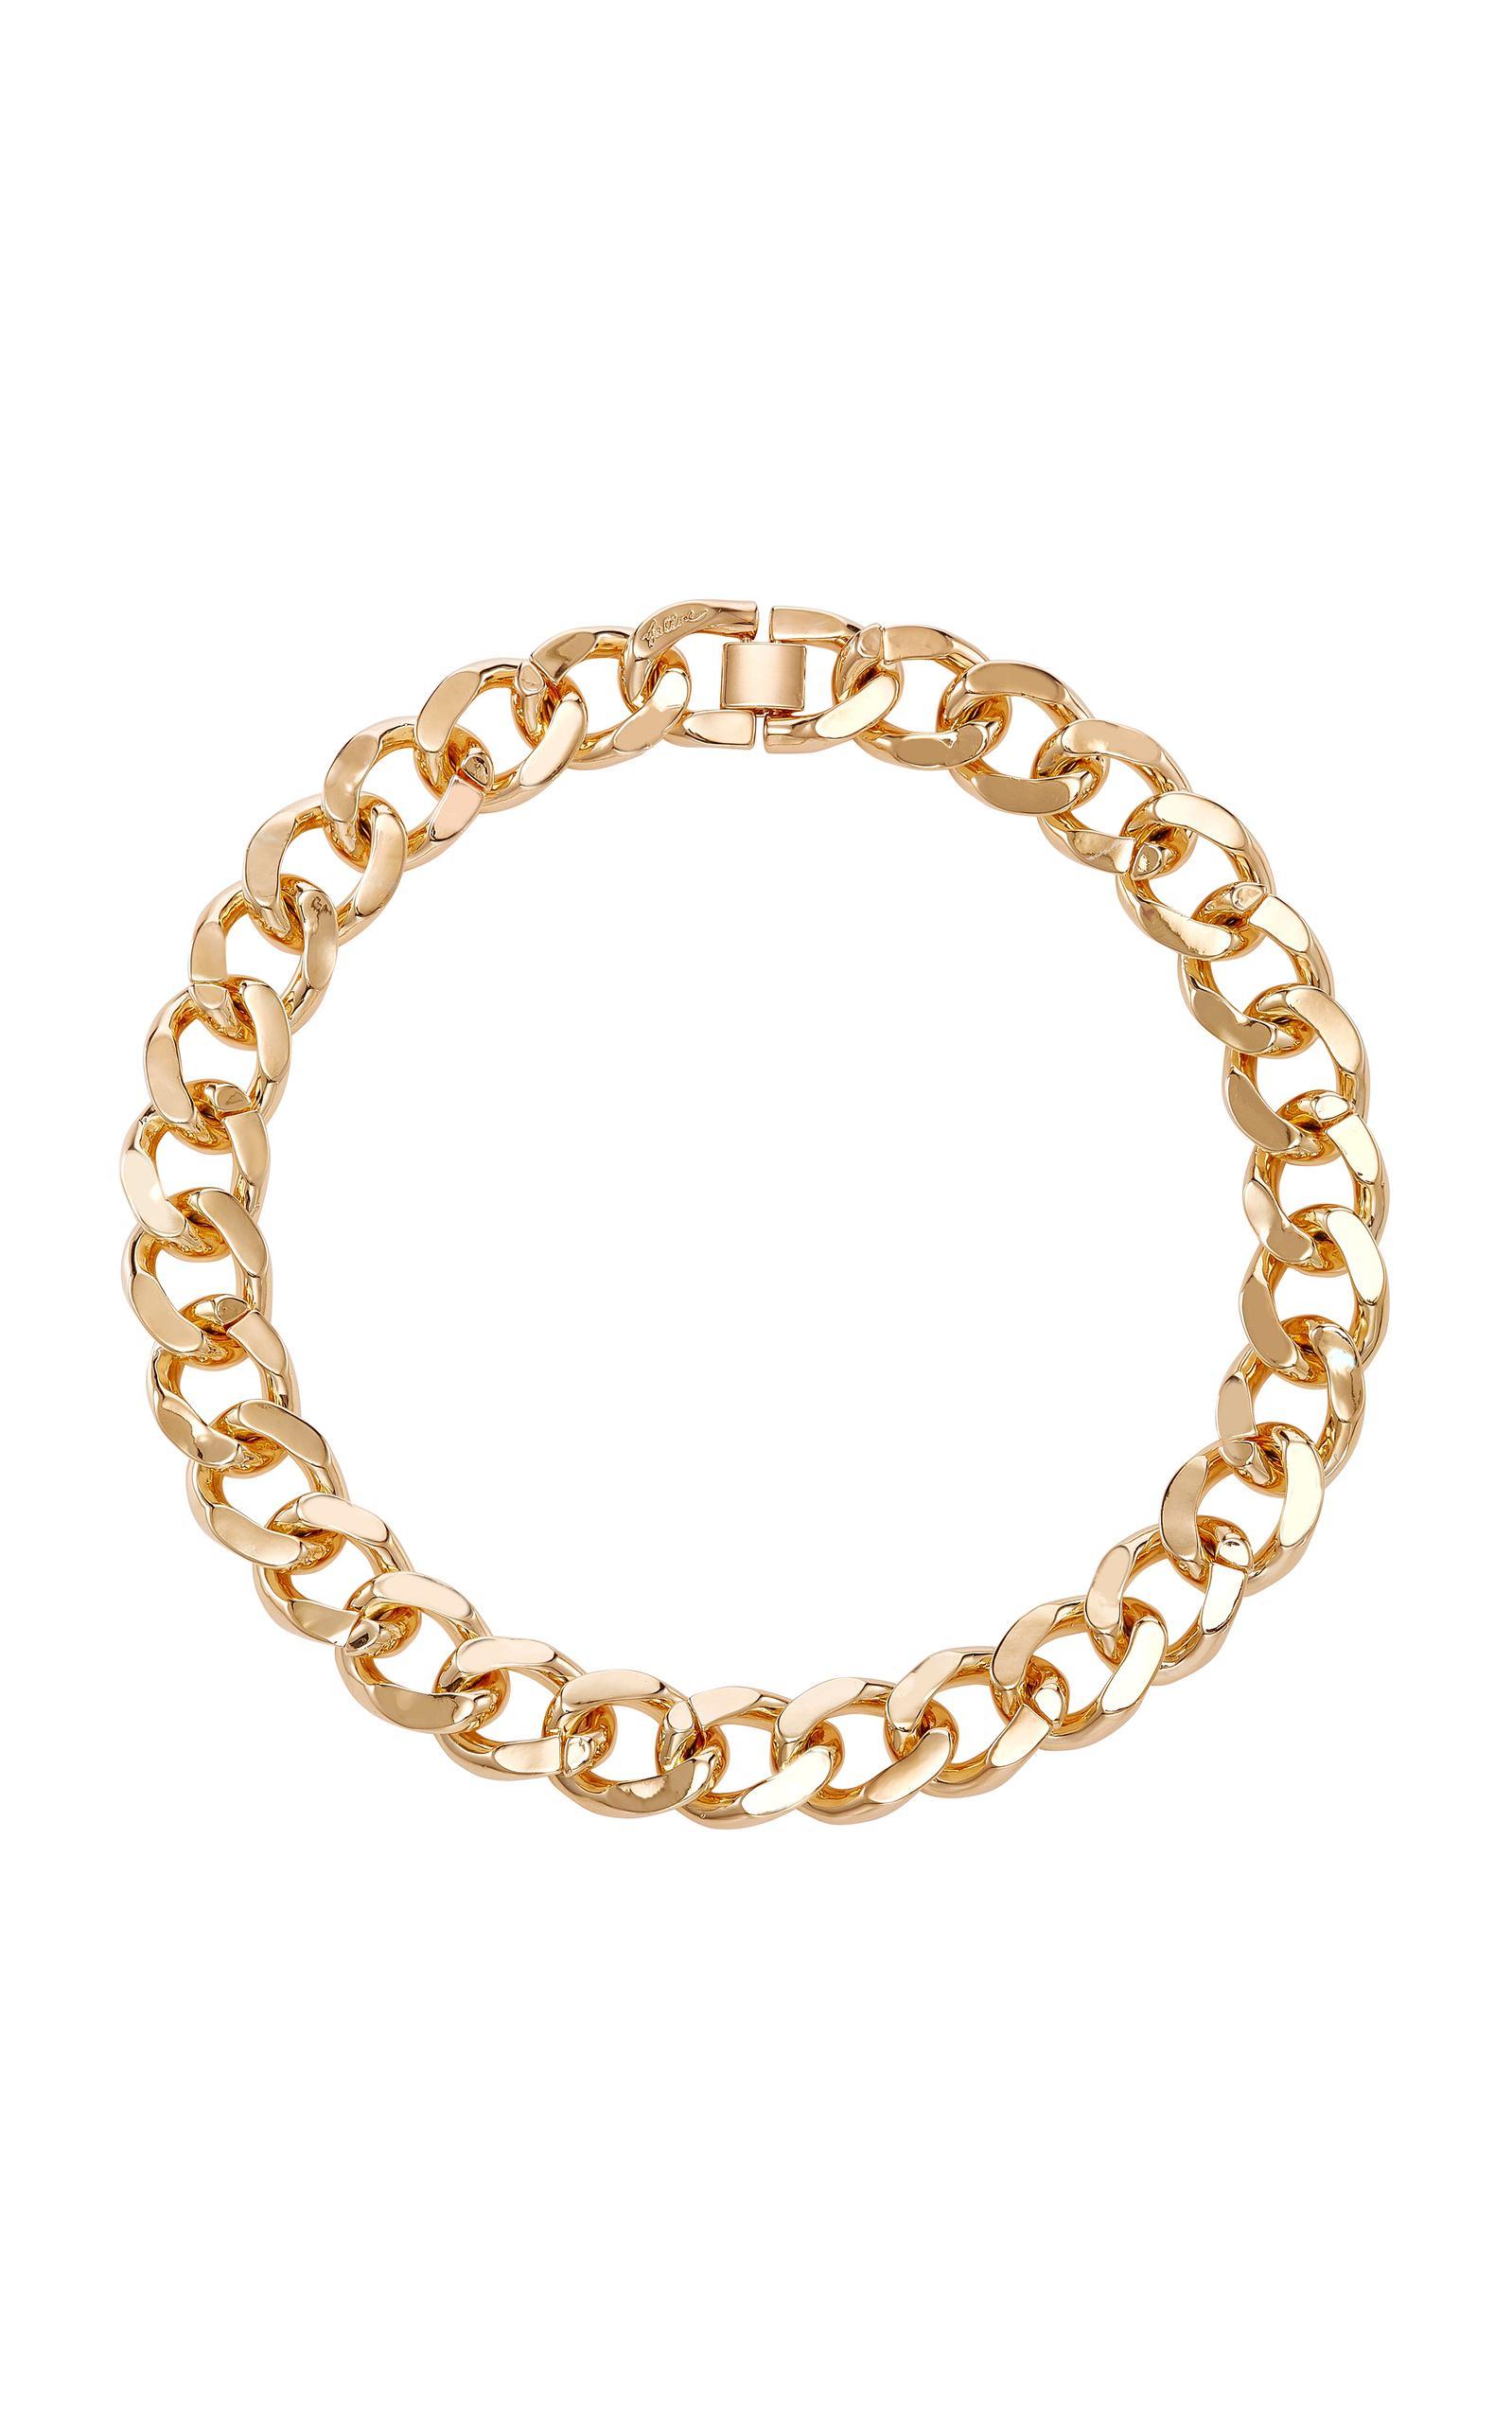 Fallon Armure Extra-Large Curb Chain Collar PhEWA40